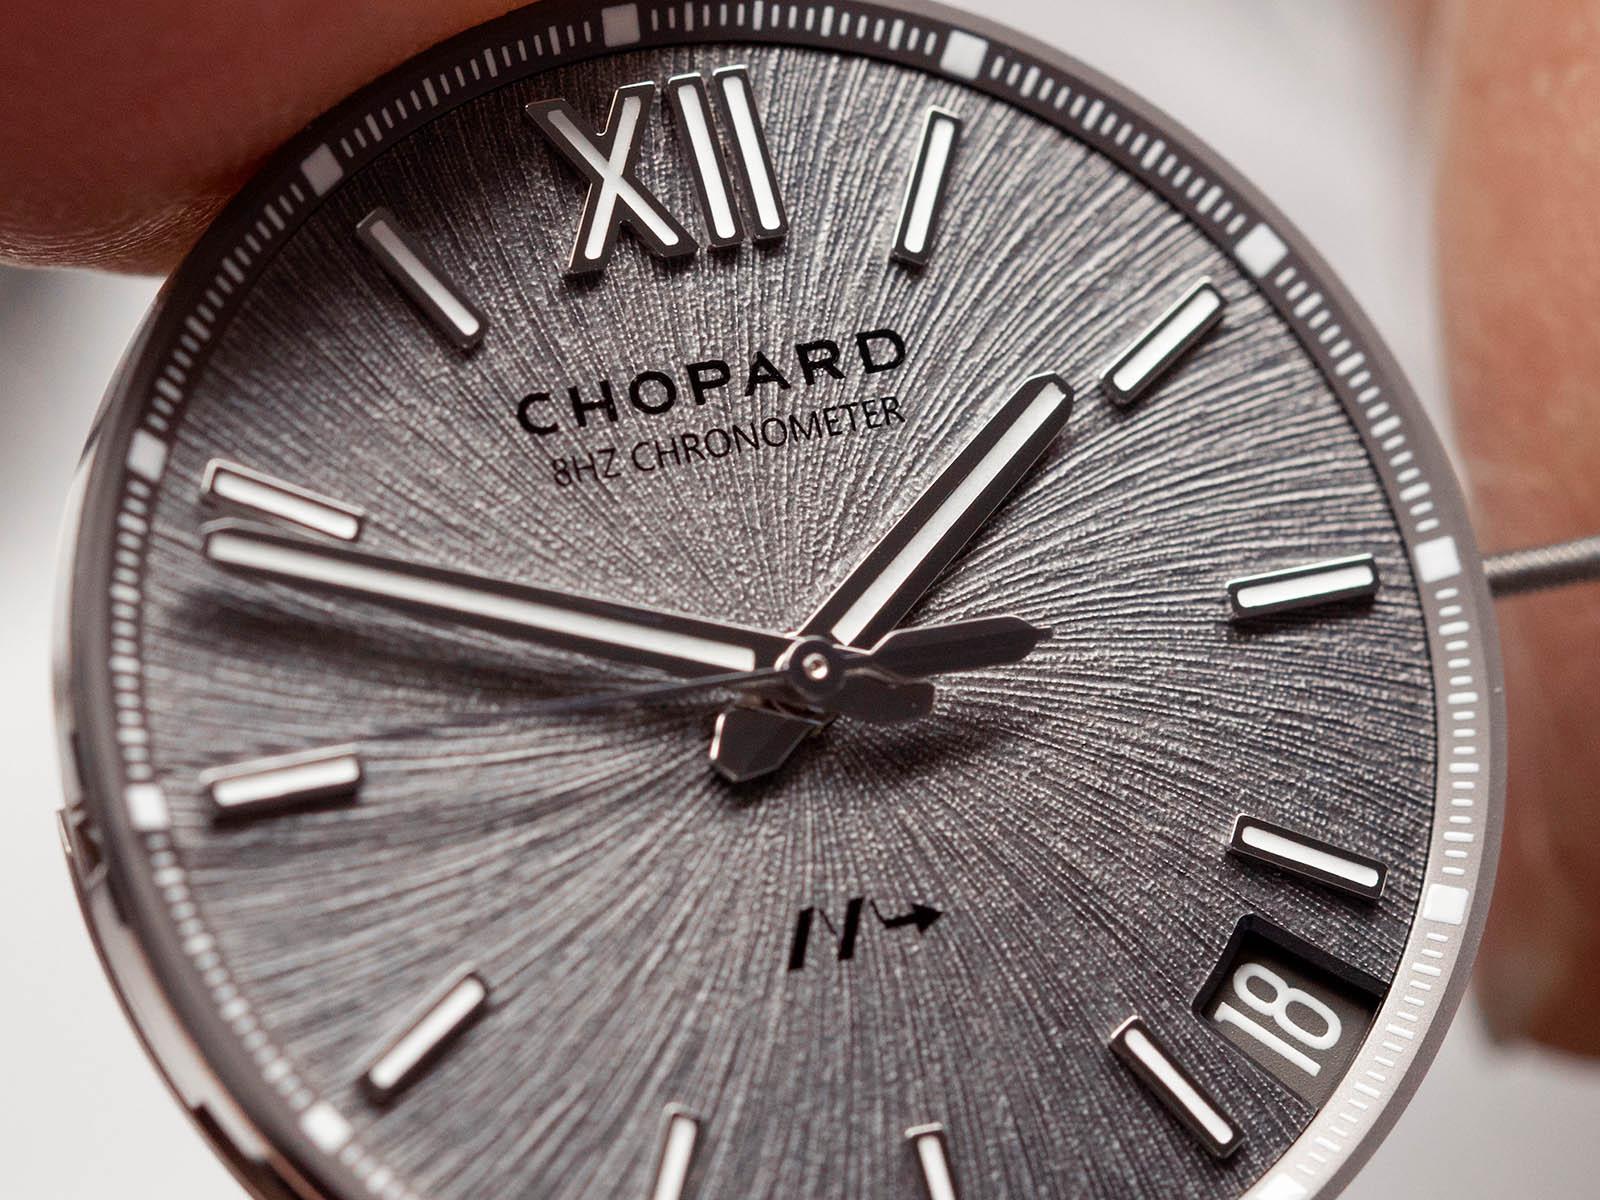 298600-3005-chopard-alpine-eagle-cadence-8hf-titanium-3.jpg